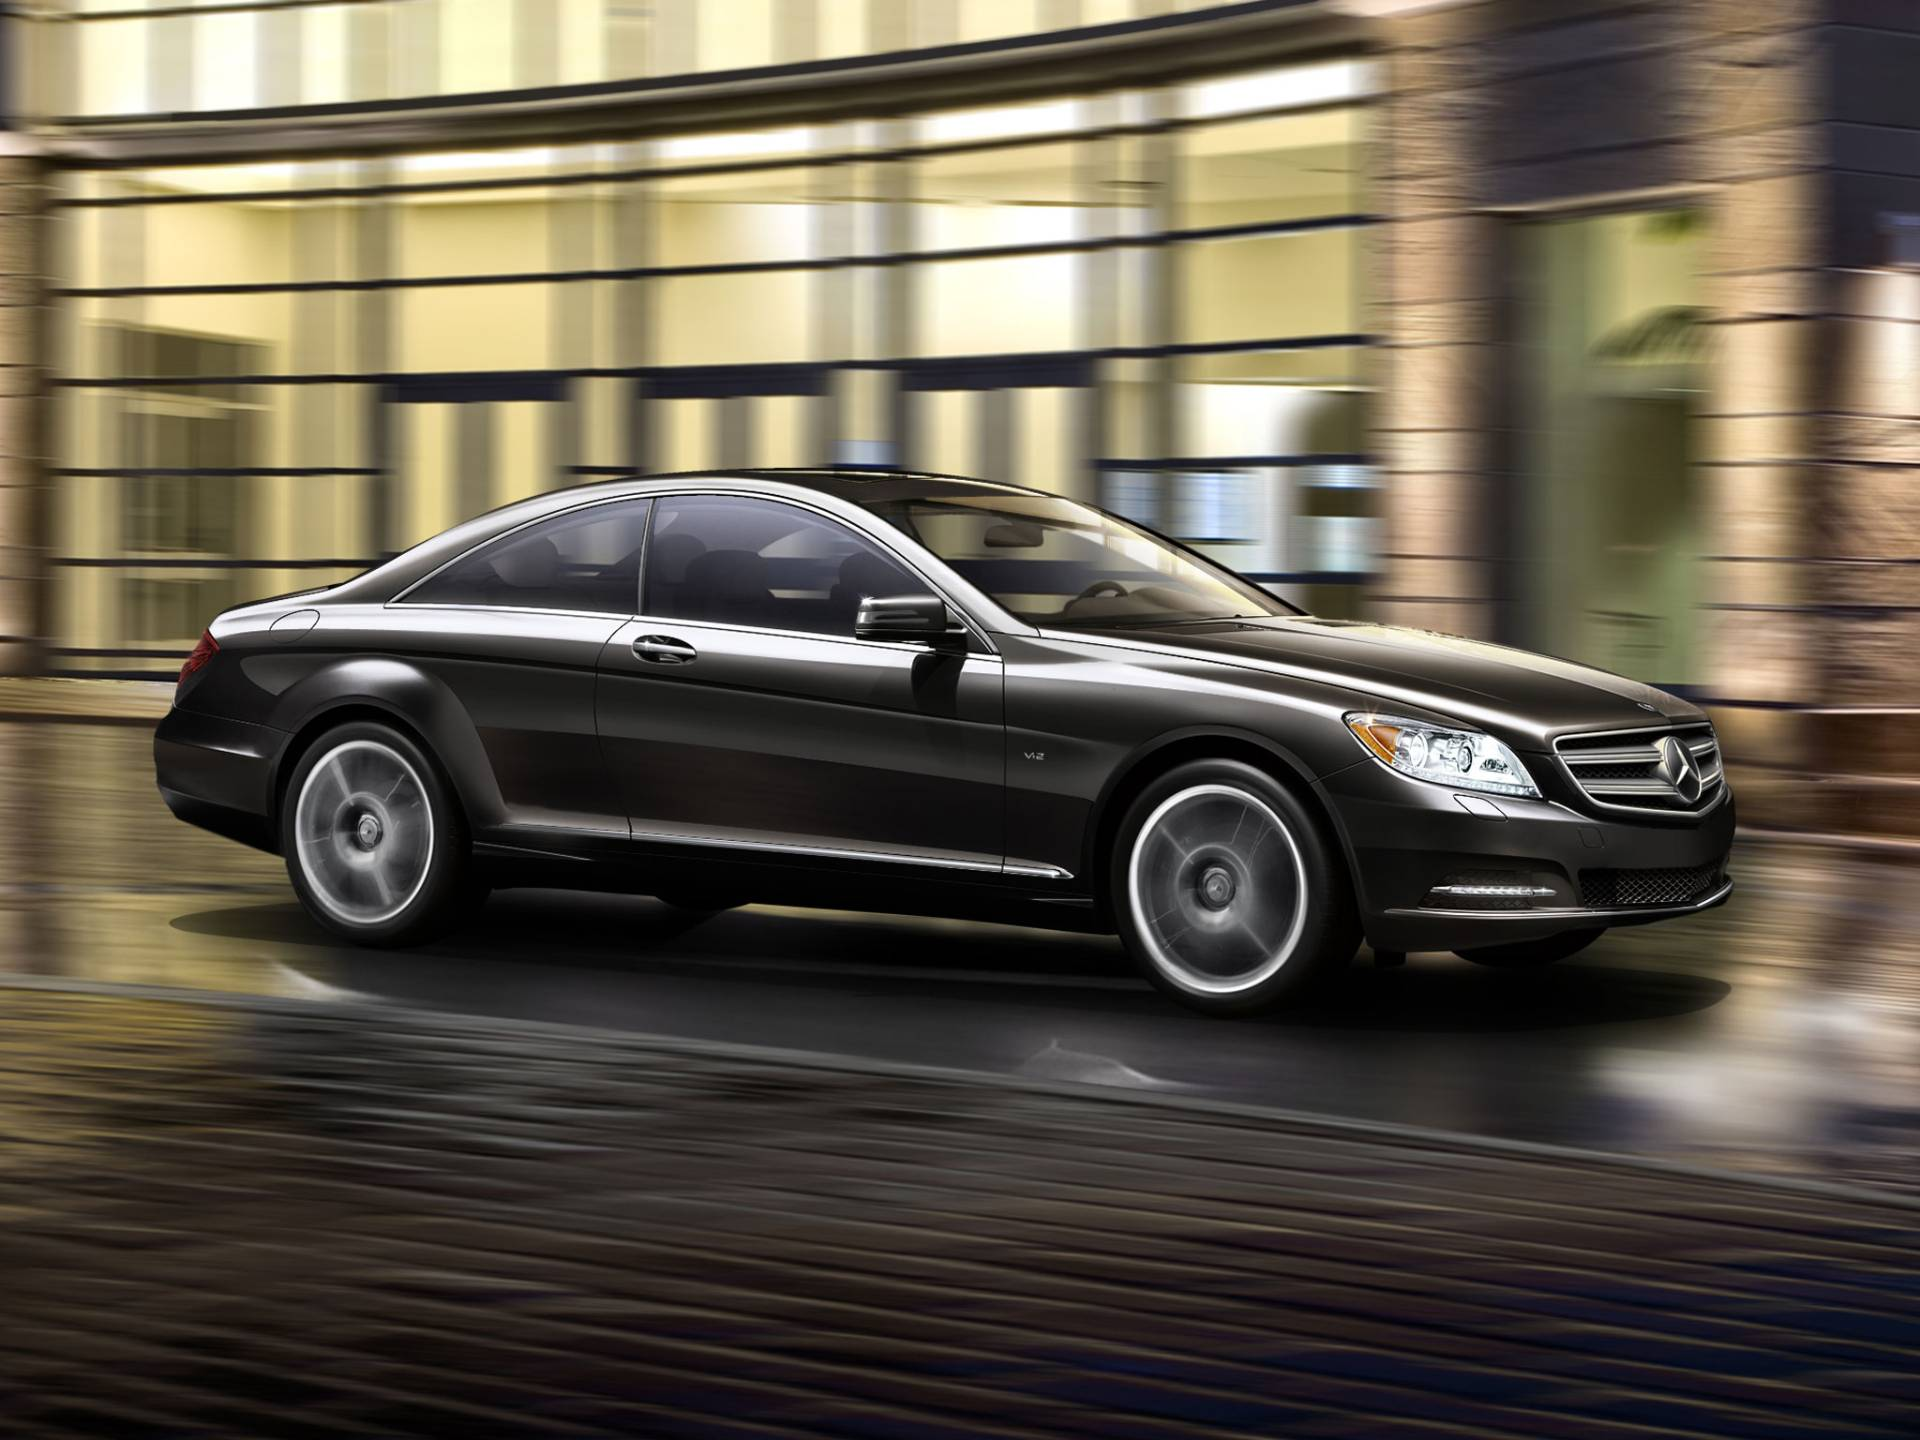 Muscle Car Hd Wallpapers 1080p 2013 Mercedes Benz Cl600 Conceptcarz Com